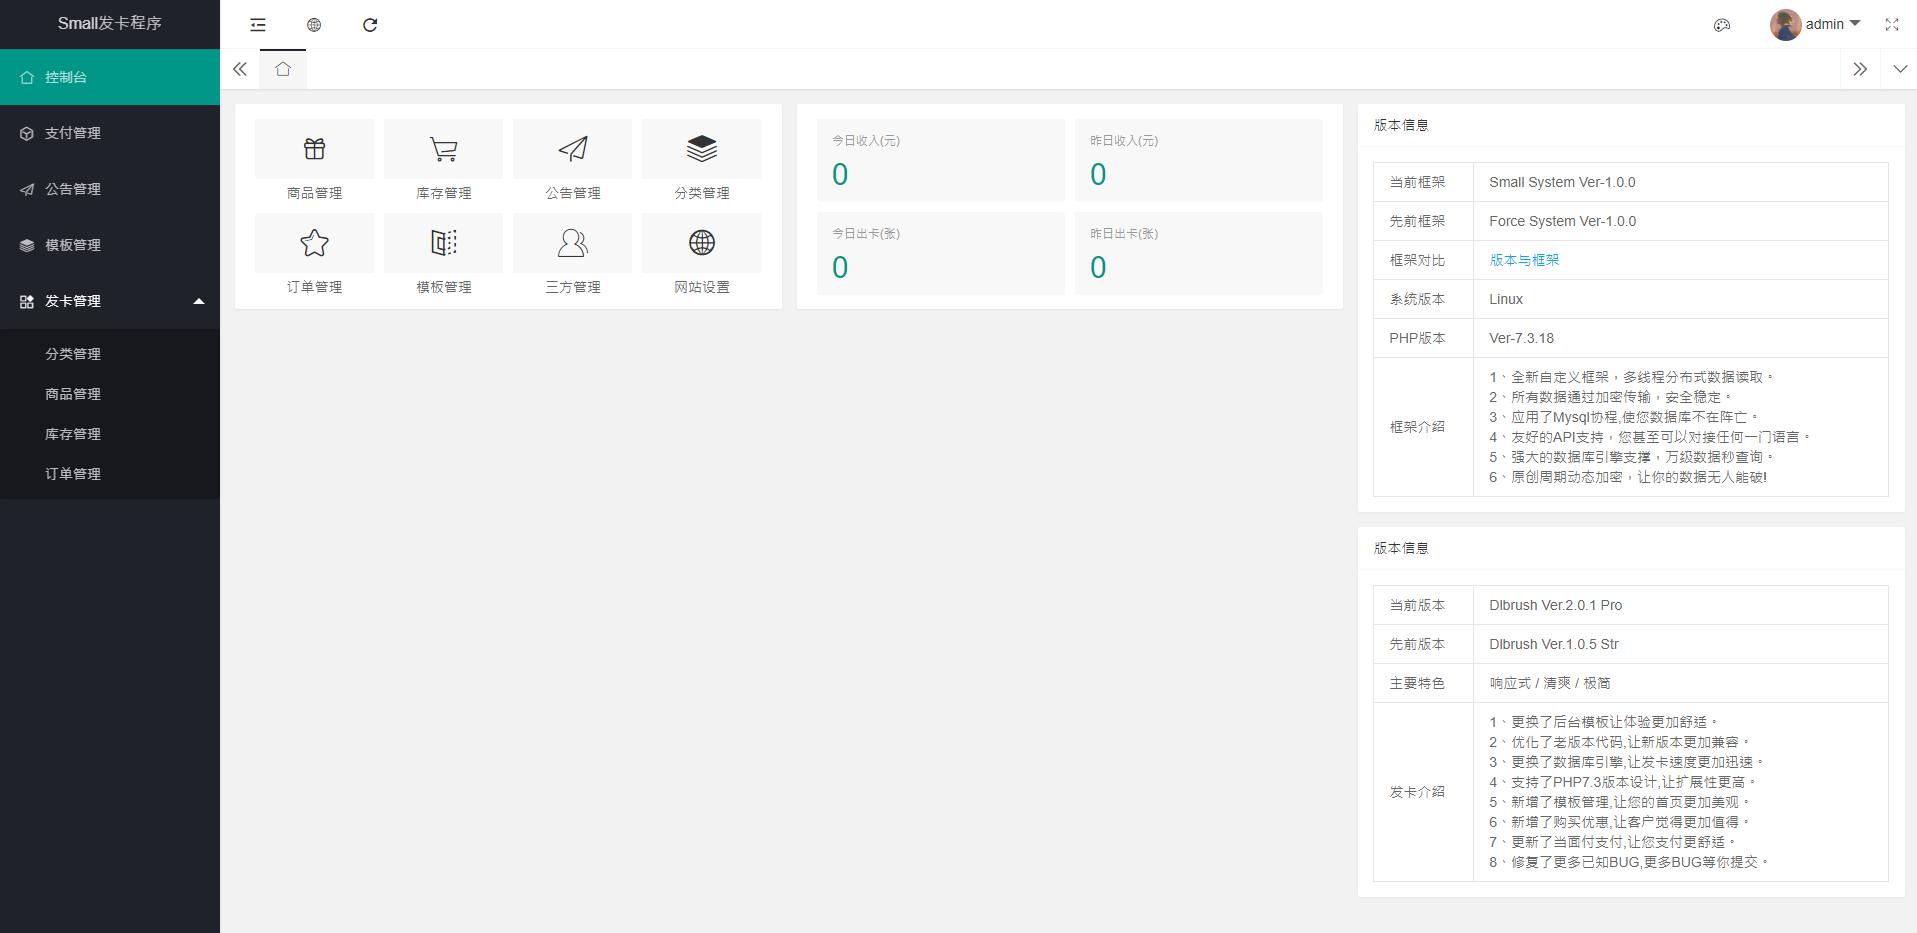 small发卡源码 V1.0.2 最新版(独家首发)